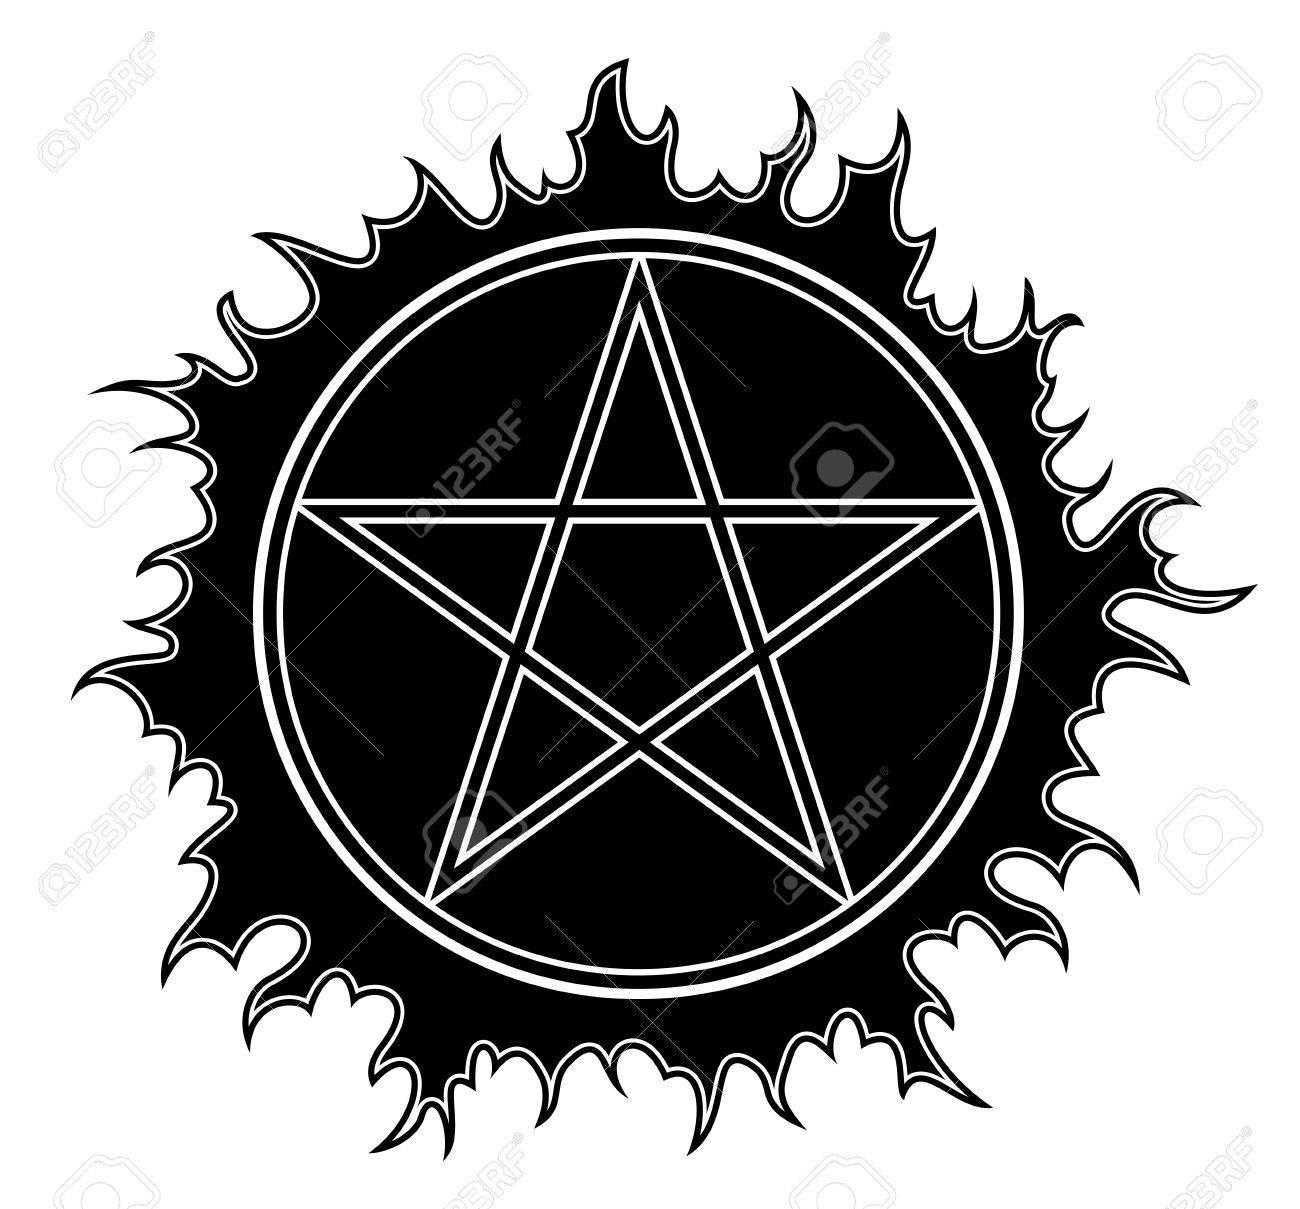 Pentagram icon star symbol isolated illustration black on white pentagram icon star symbol isolated illustration black on white background stock vector biocorpaavc Choice Image